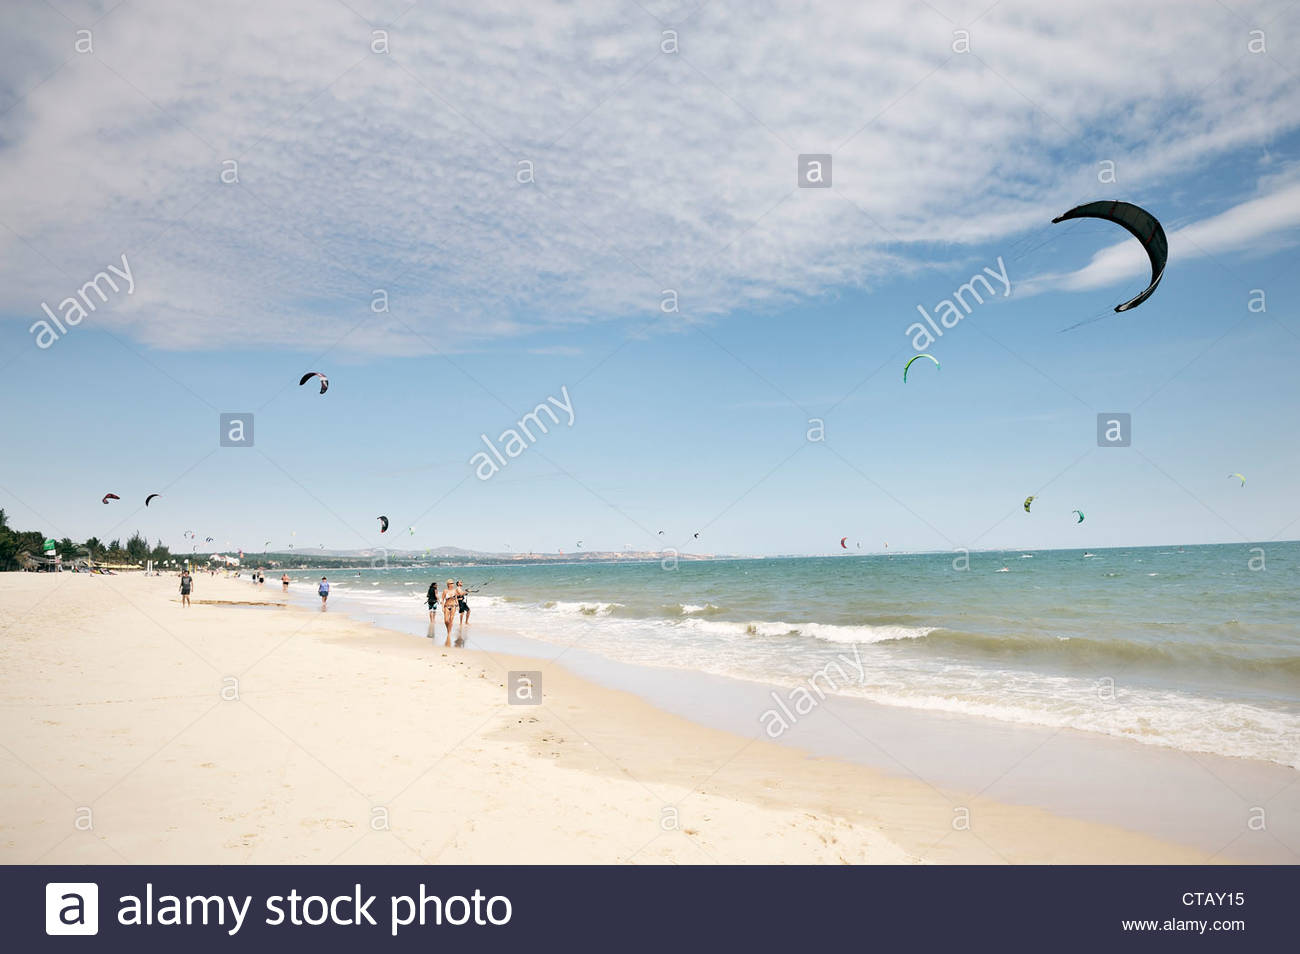 Kite surfer crowd at beach, South China Sea, Mui Ne, Binh Thuan, Vietnam - Stock Image